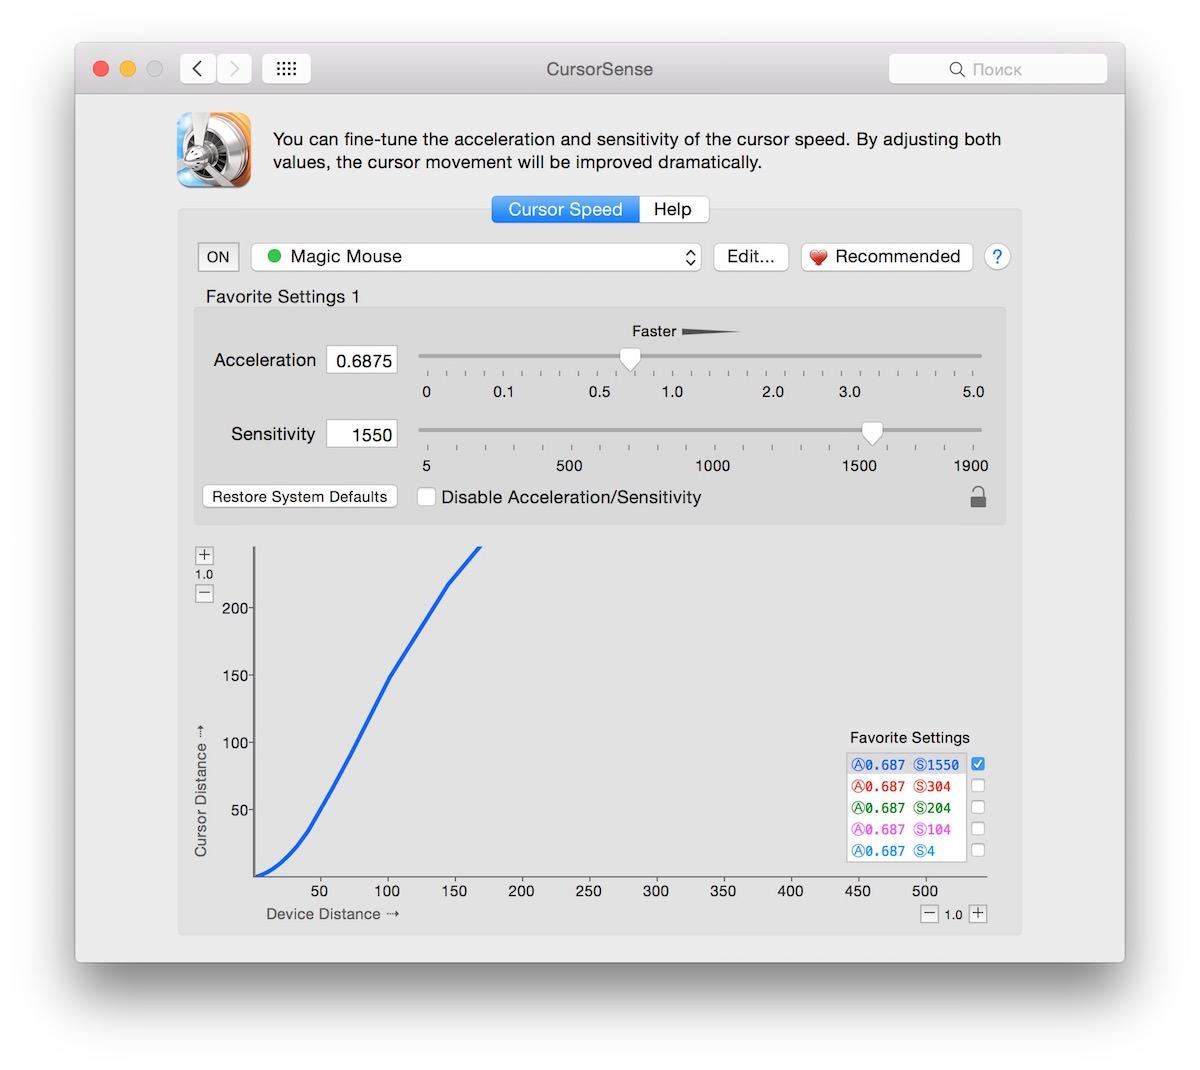 Magic Mouse Apple OS X Yosemite Mavericks Setting CursorSense  Acceleration